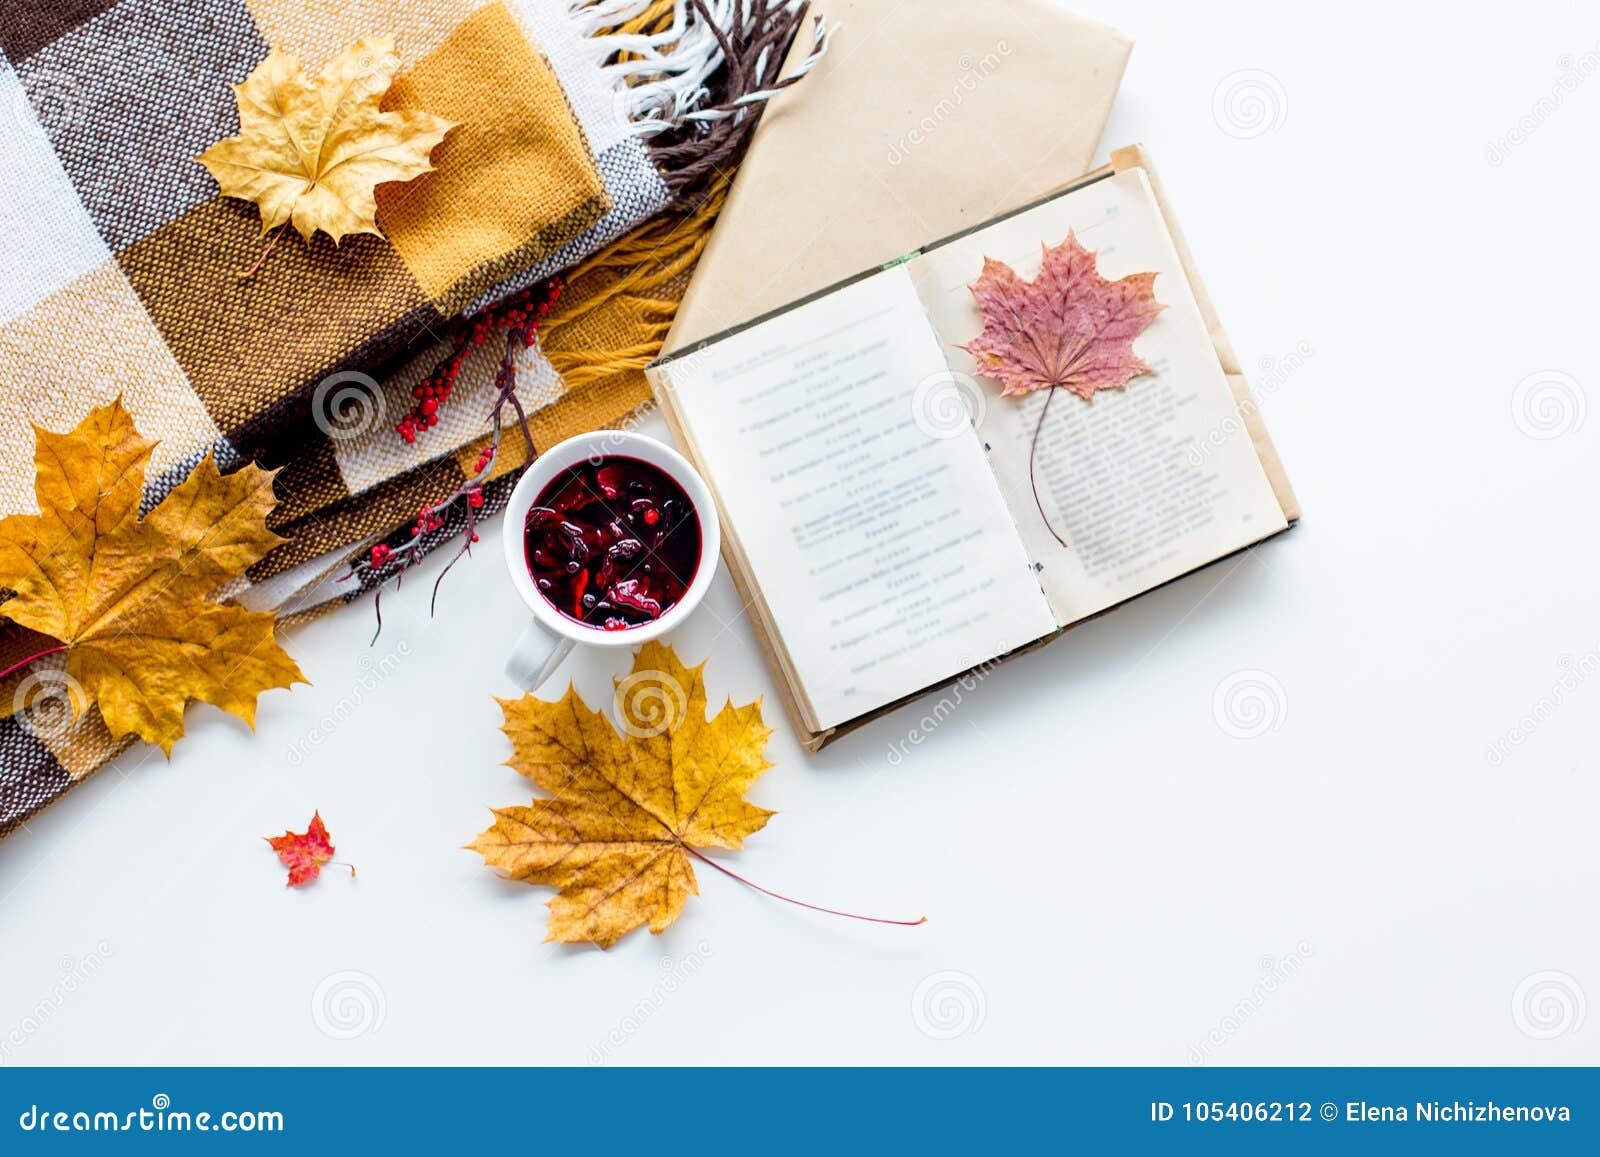 Download Υπόβαθρο με τα κίτρινα φύλλα φθινοπώρου Στοκ Εικόνες - εικόνα από τραχύς, φύλλωμα: 105406212